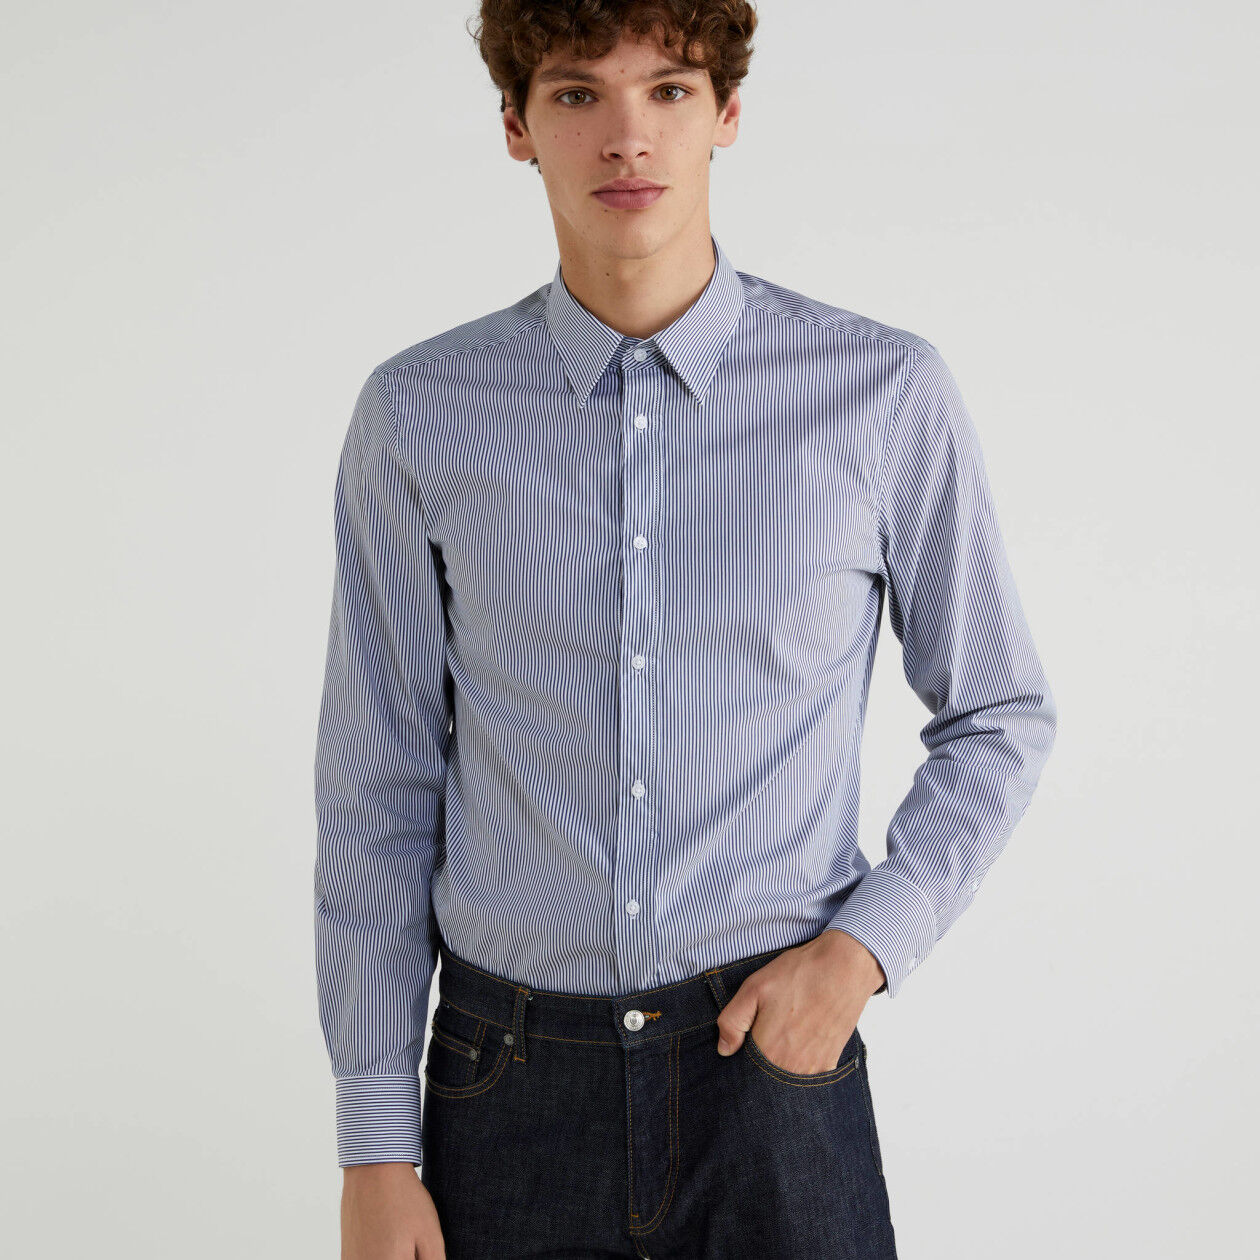 Camisa fio tinto slim fit